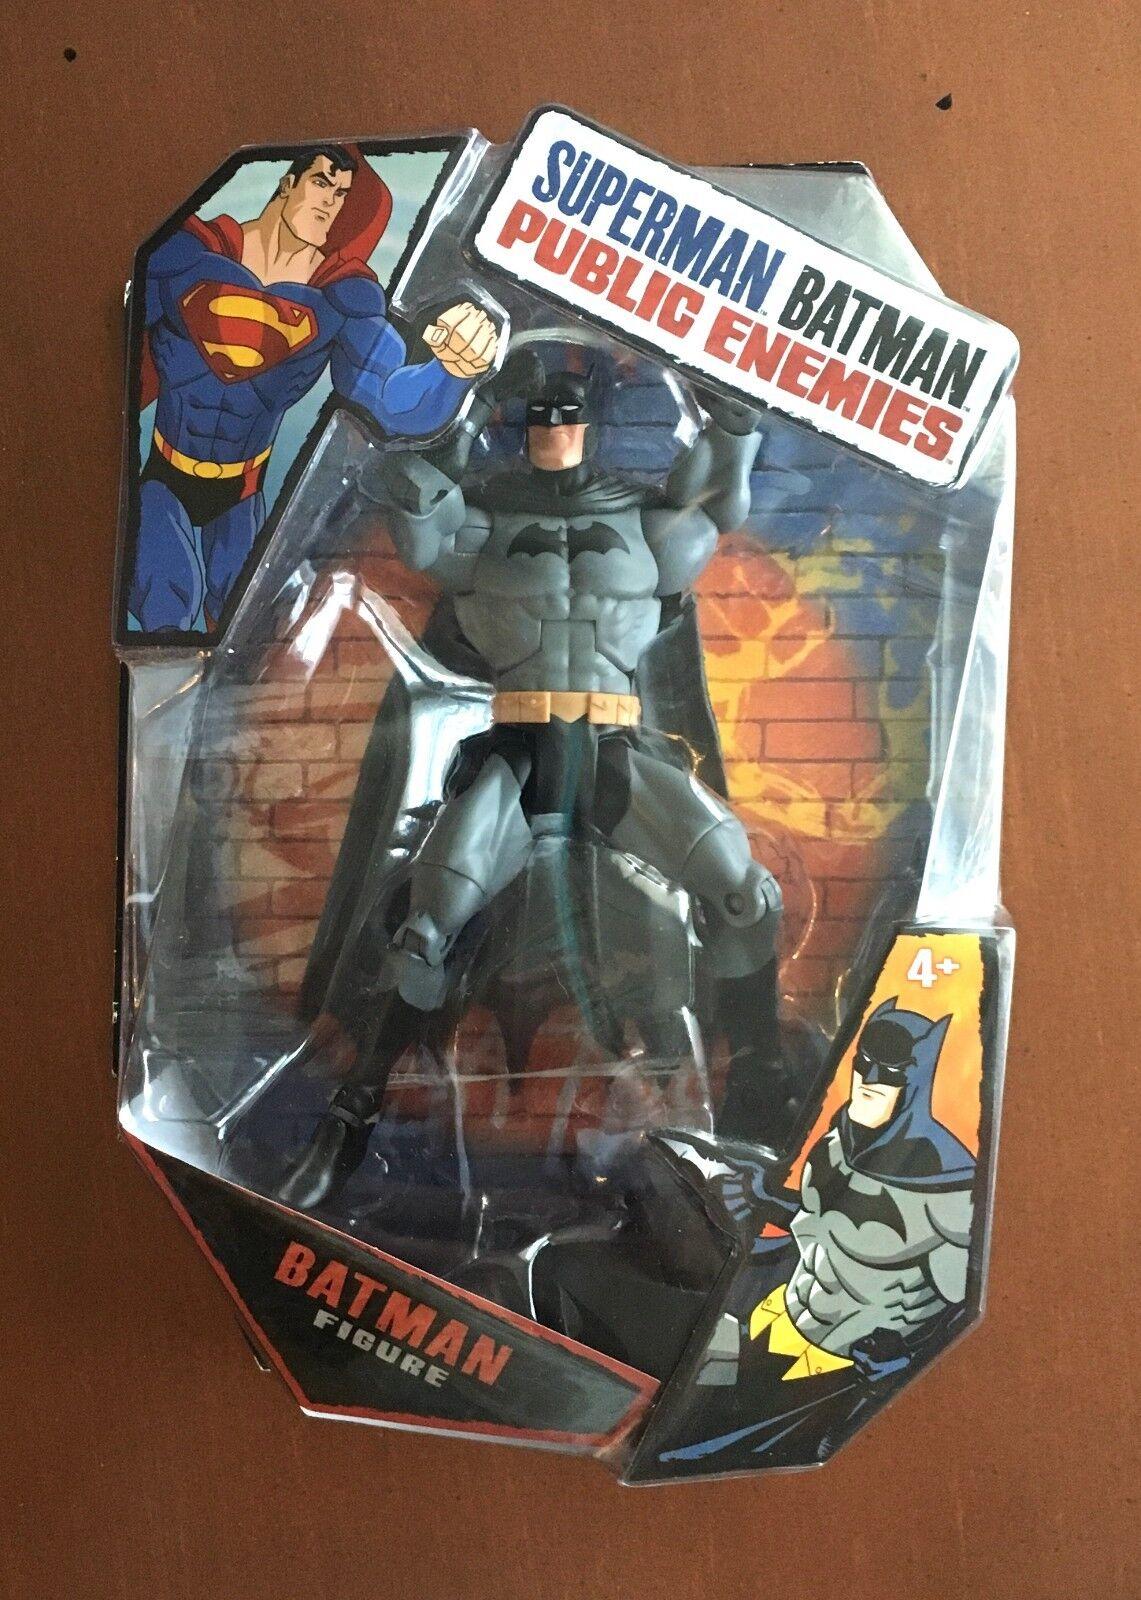 Neuf DC ennemis publics Batman Figurine Mattel